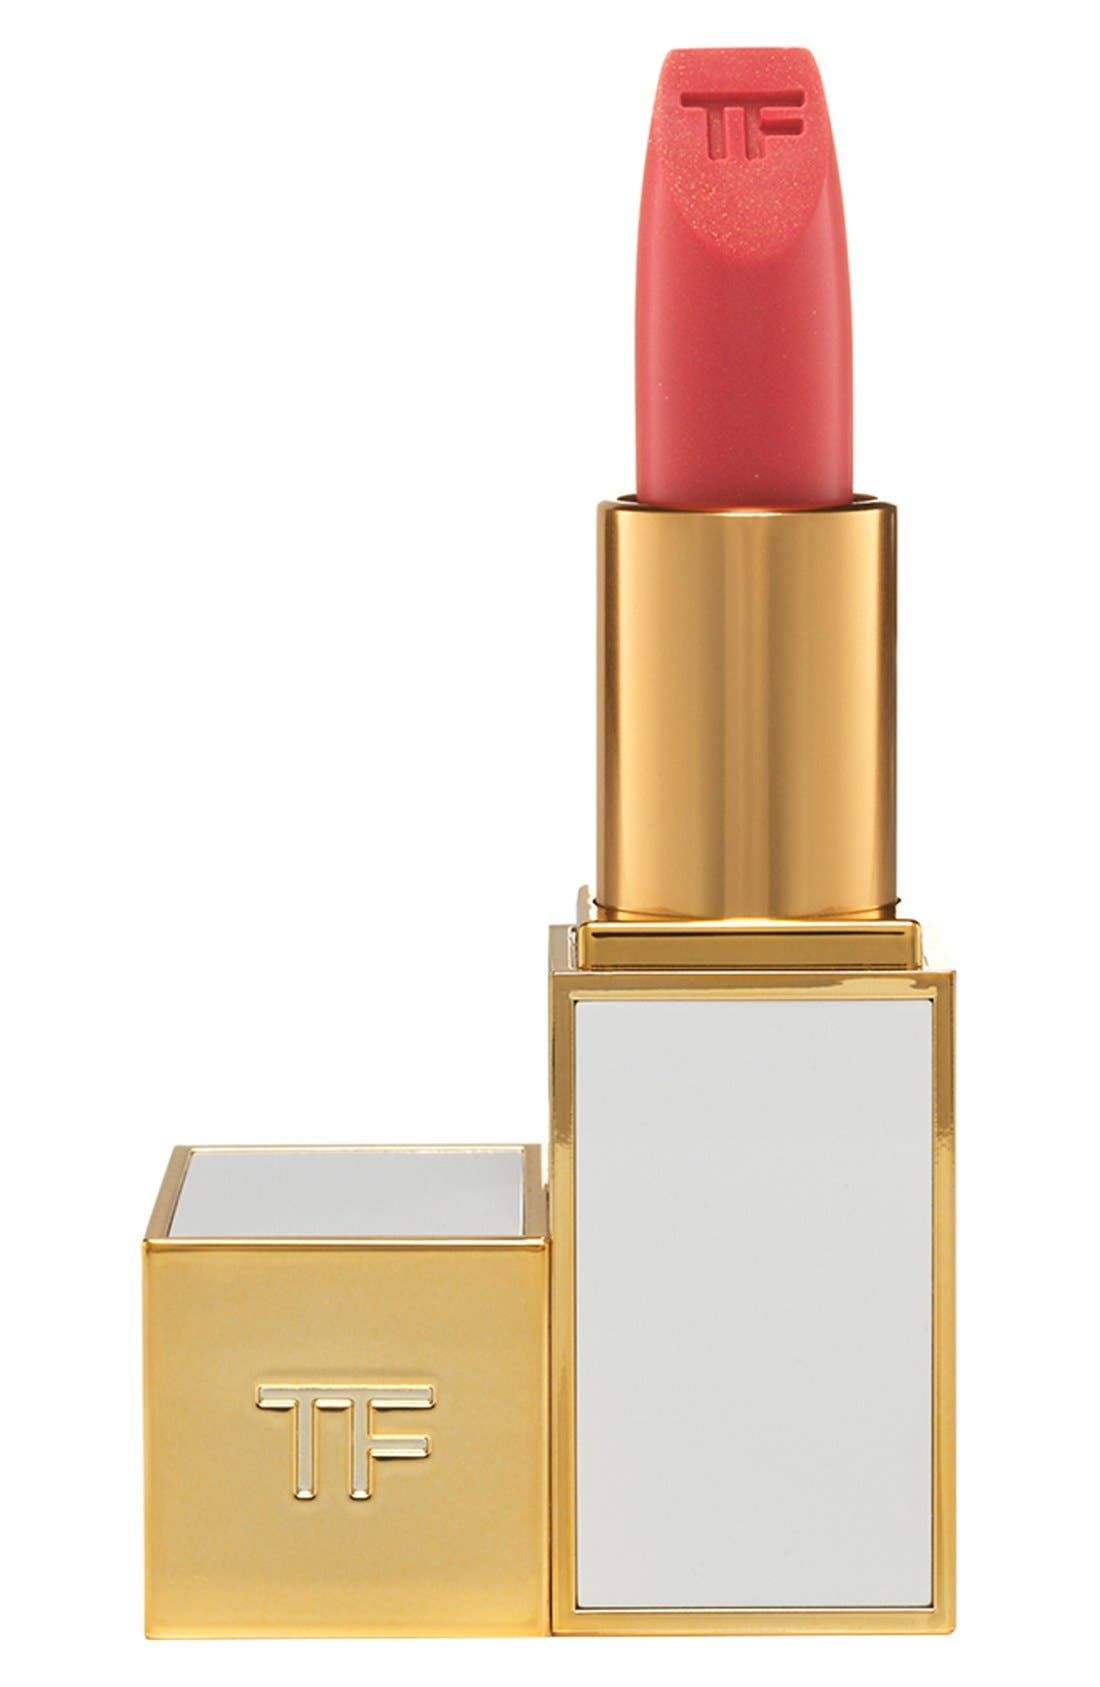 Tom Ford Sheer Lip Color